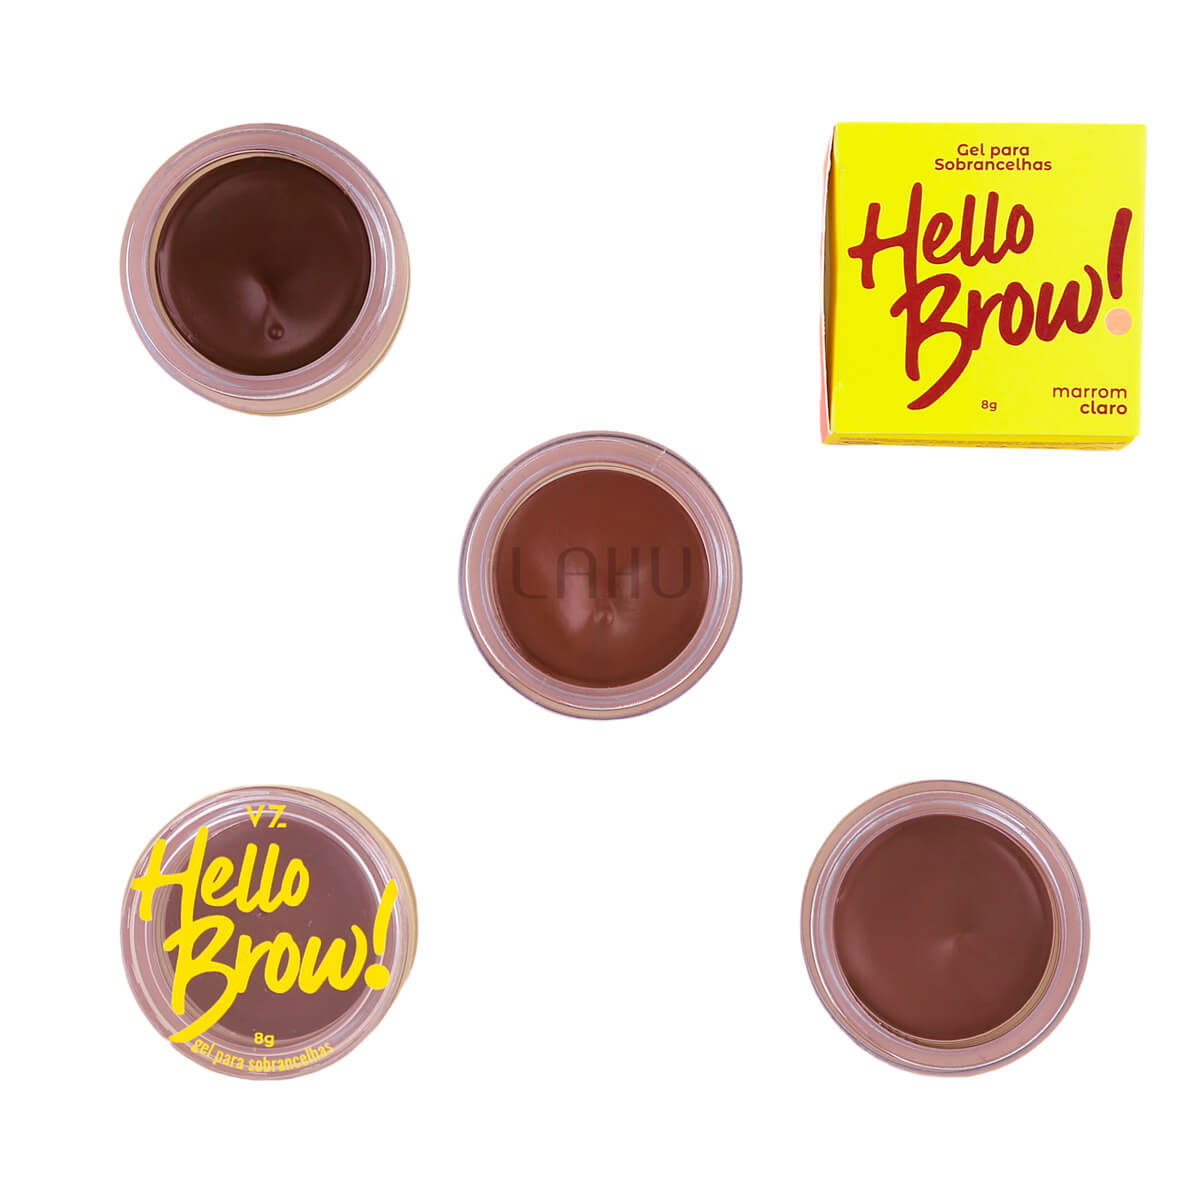 Gel para Sobrancelha Vizzela Hello Brow